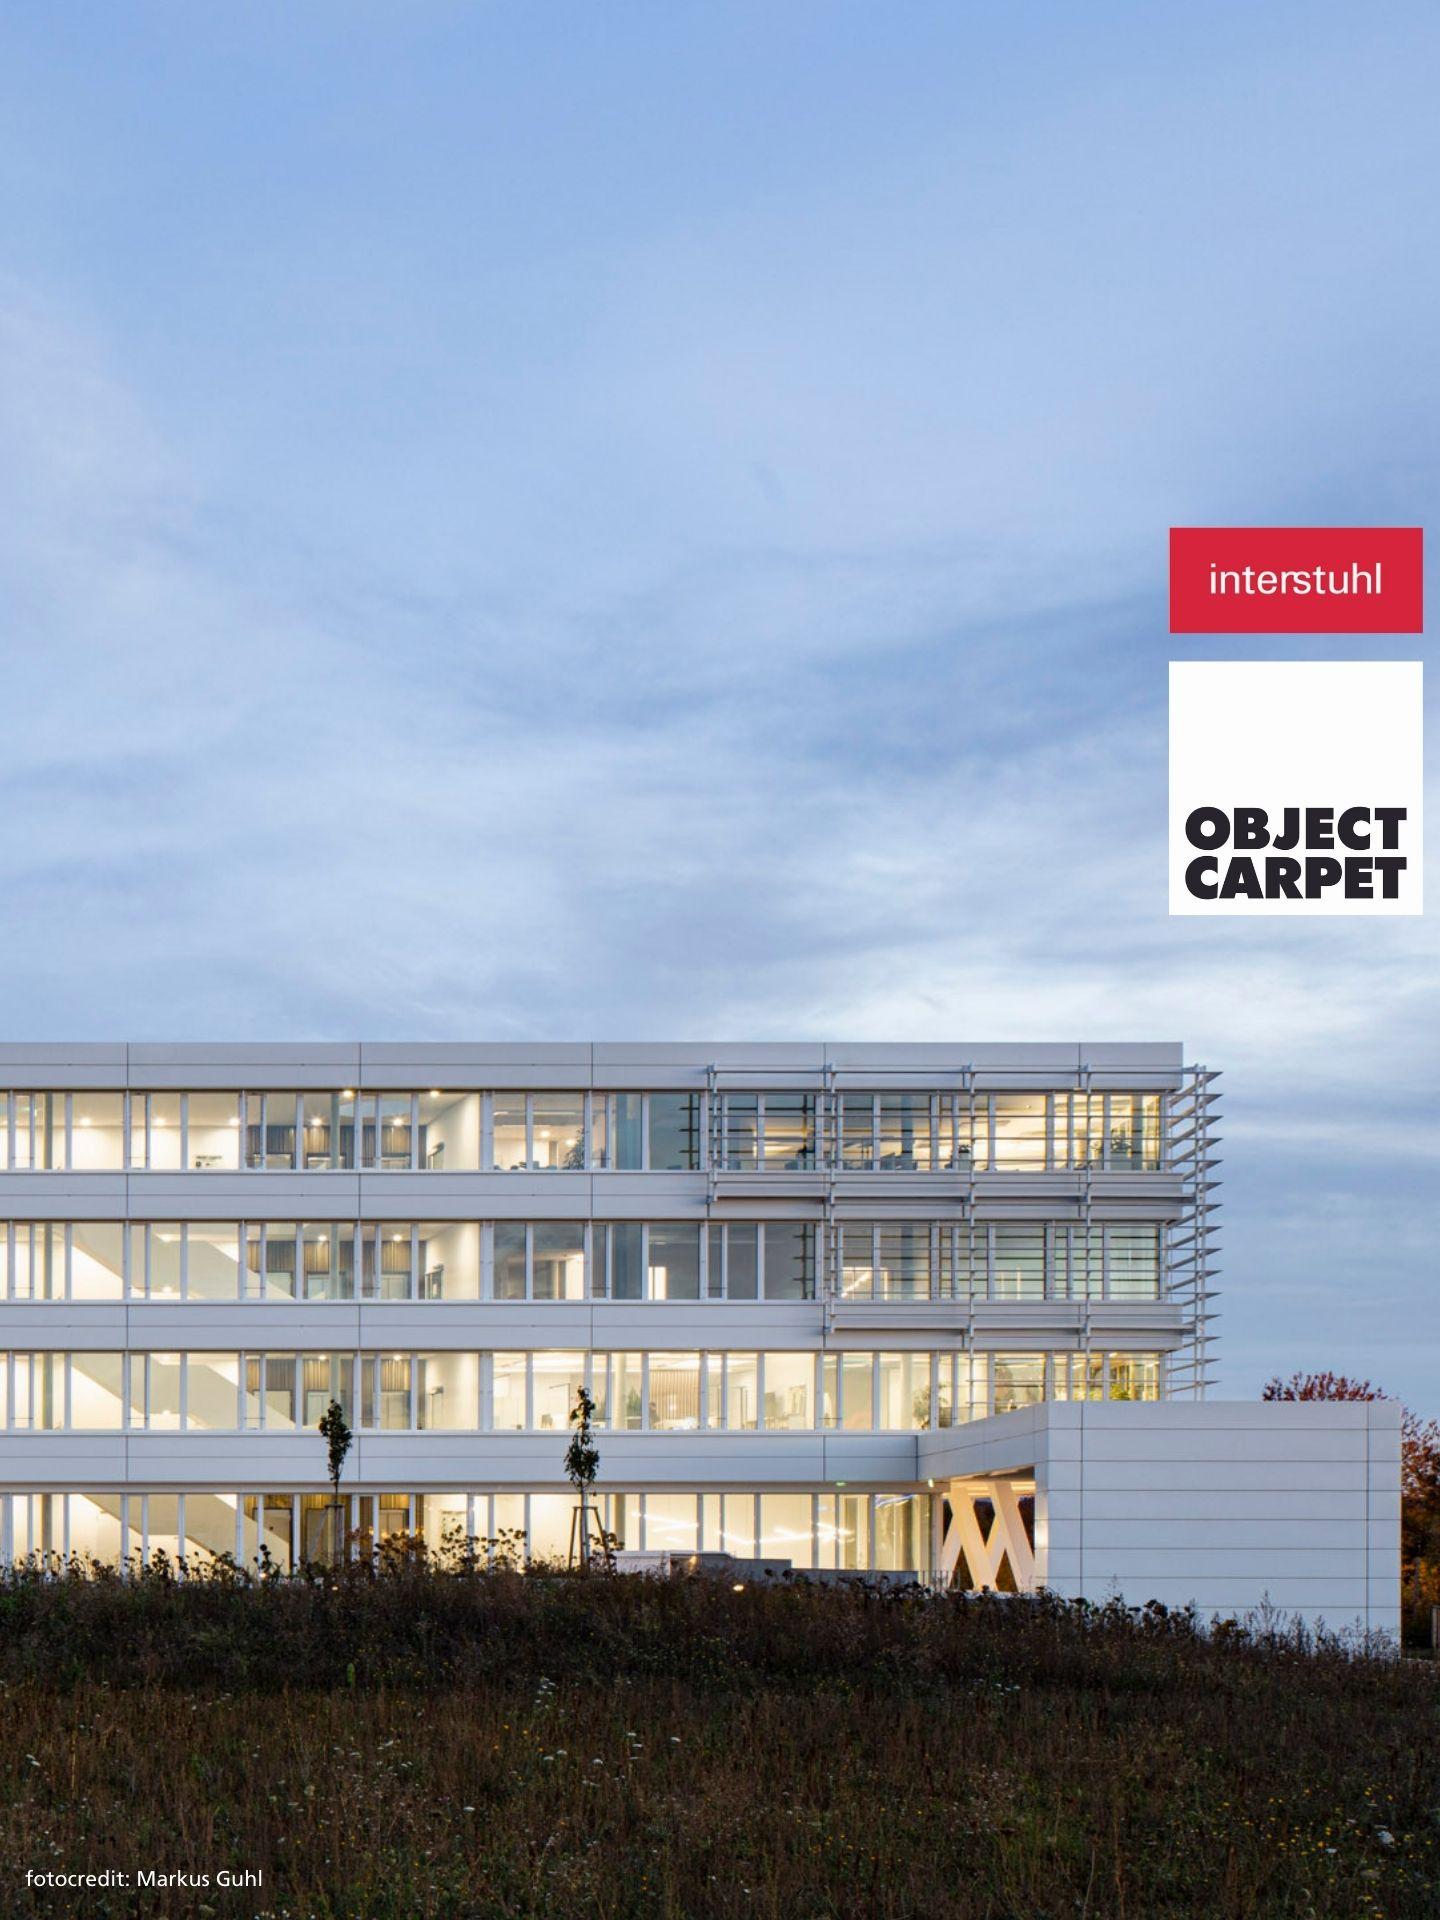 How do we make NEW WORK work? - Interstuhl & OBJECT CARPET